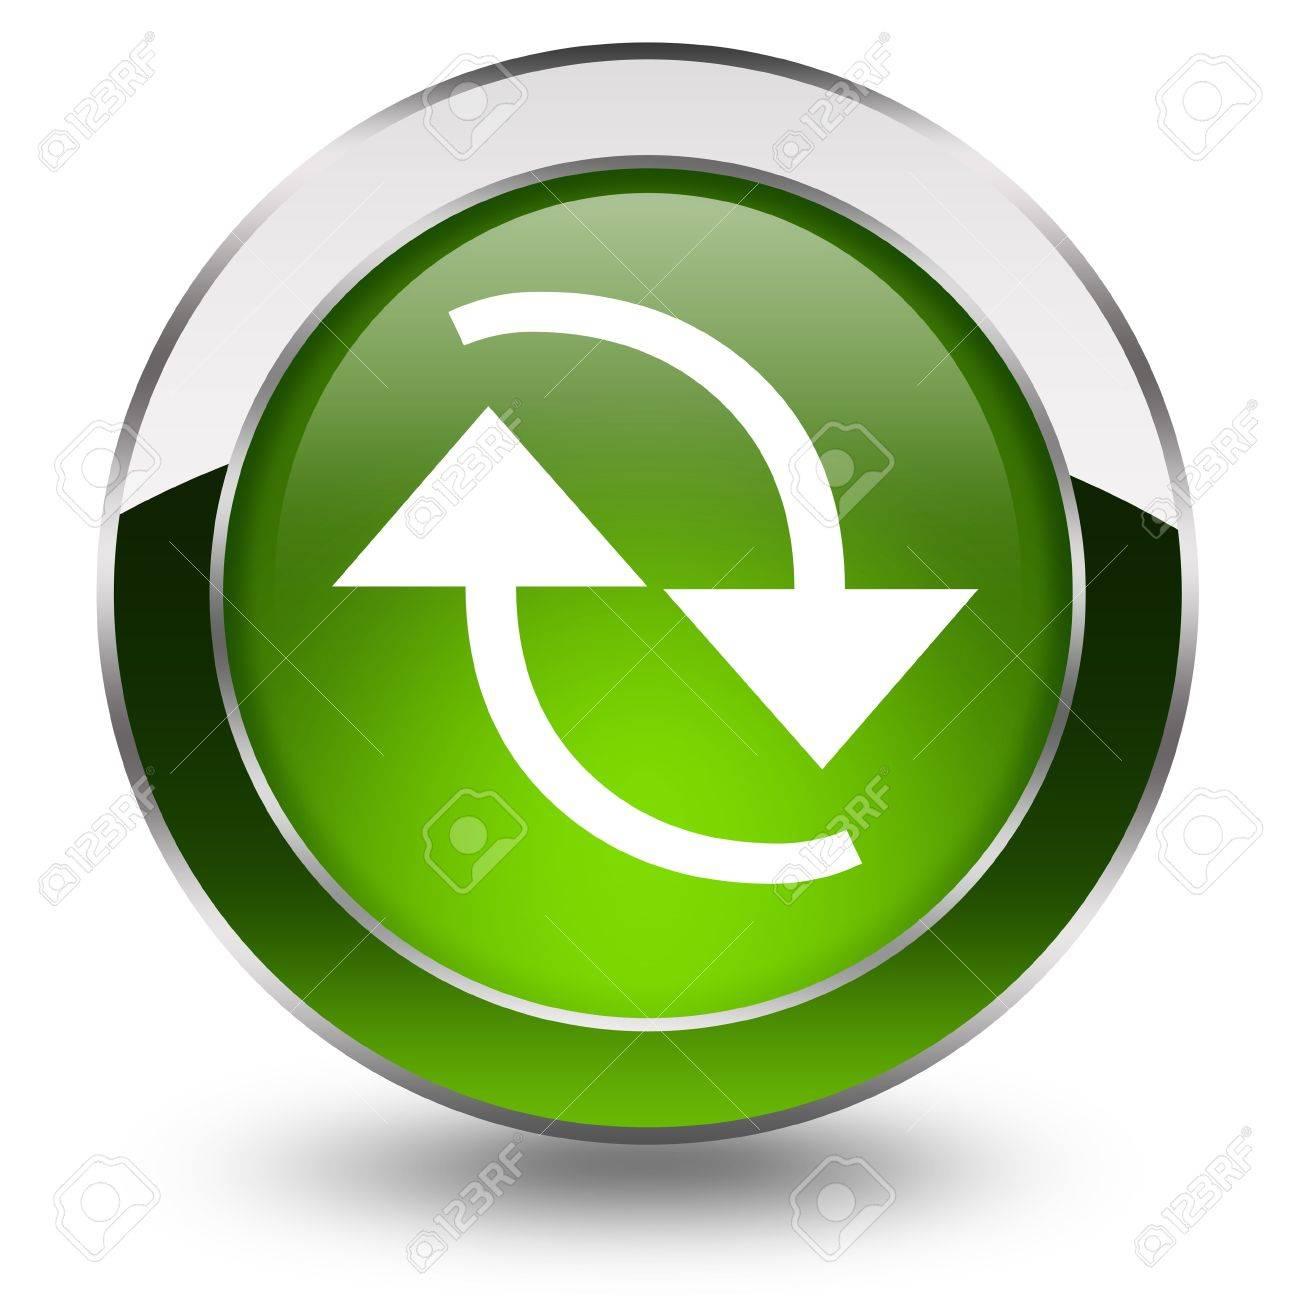 Refresh button Stock Photo - 12894949